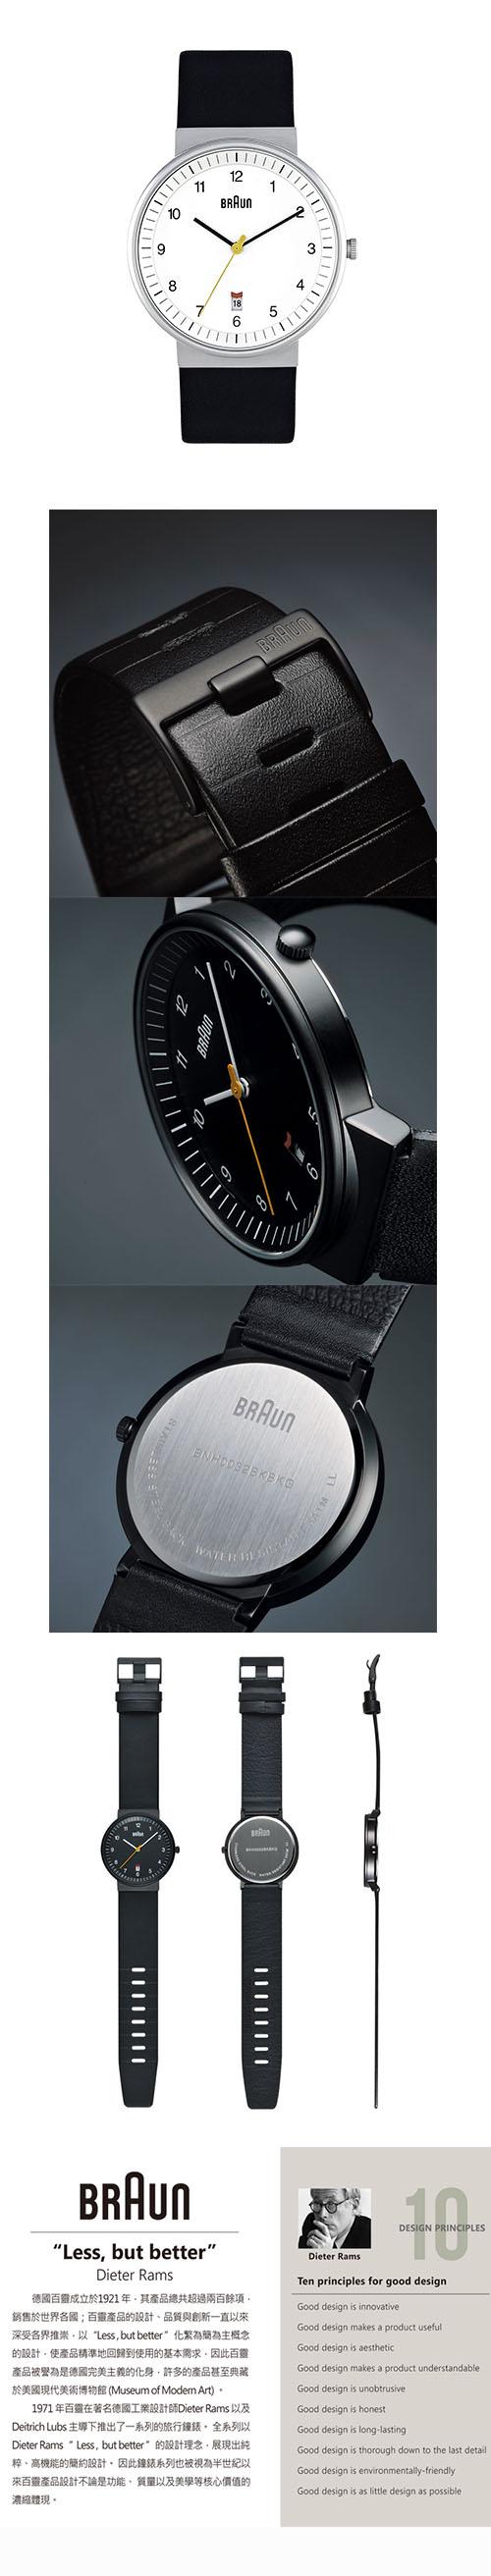 BRAUN 日期顯示 男款石英錶 BN0032 白